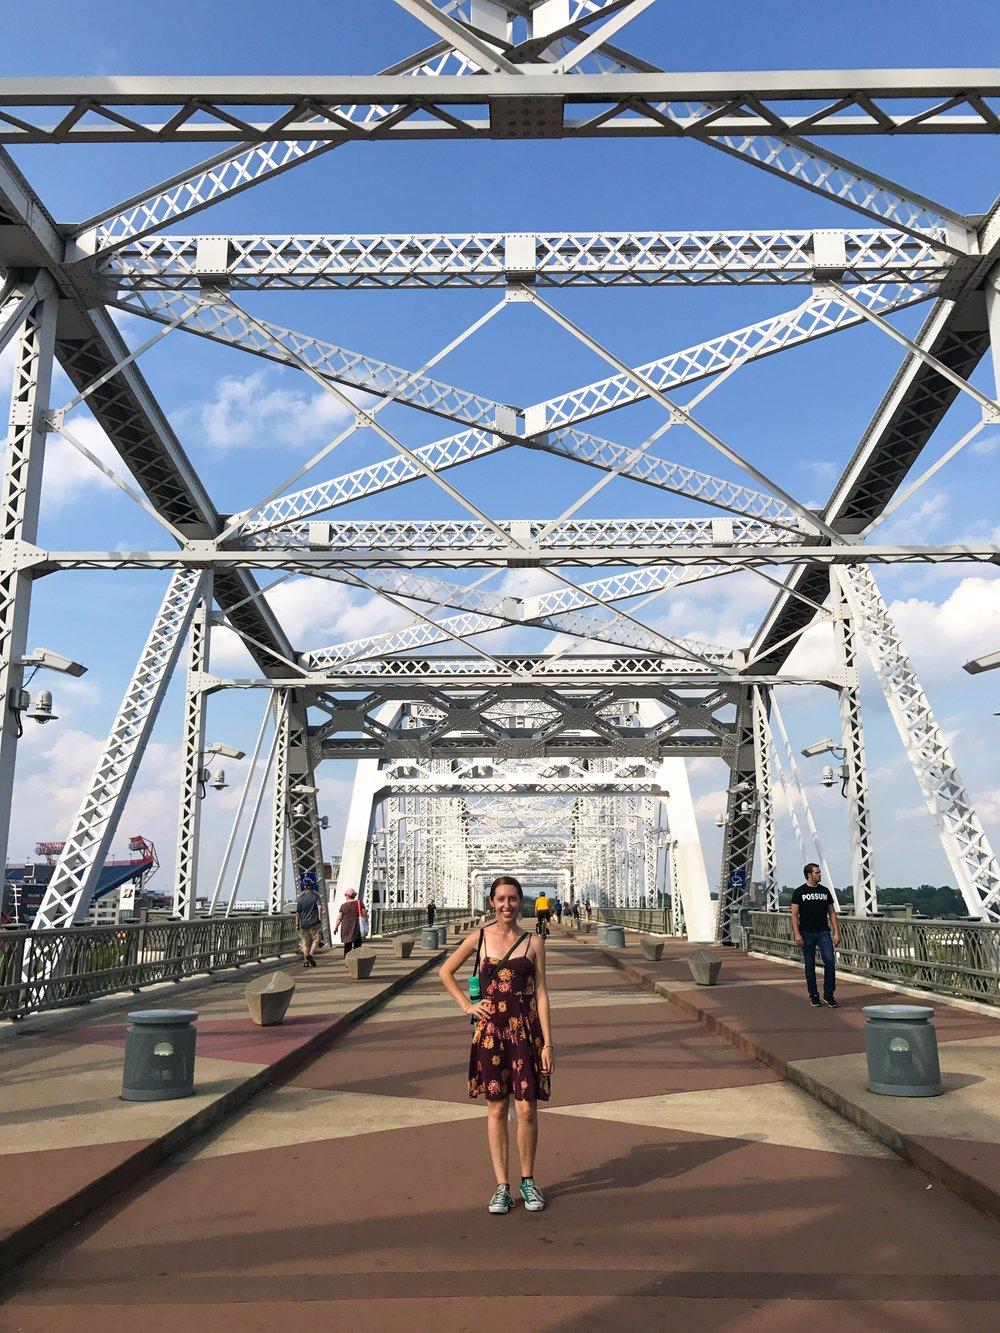 The pedestrian bridge